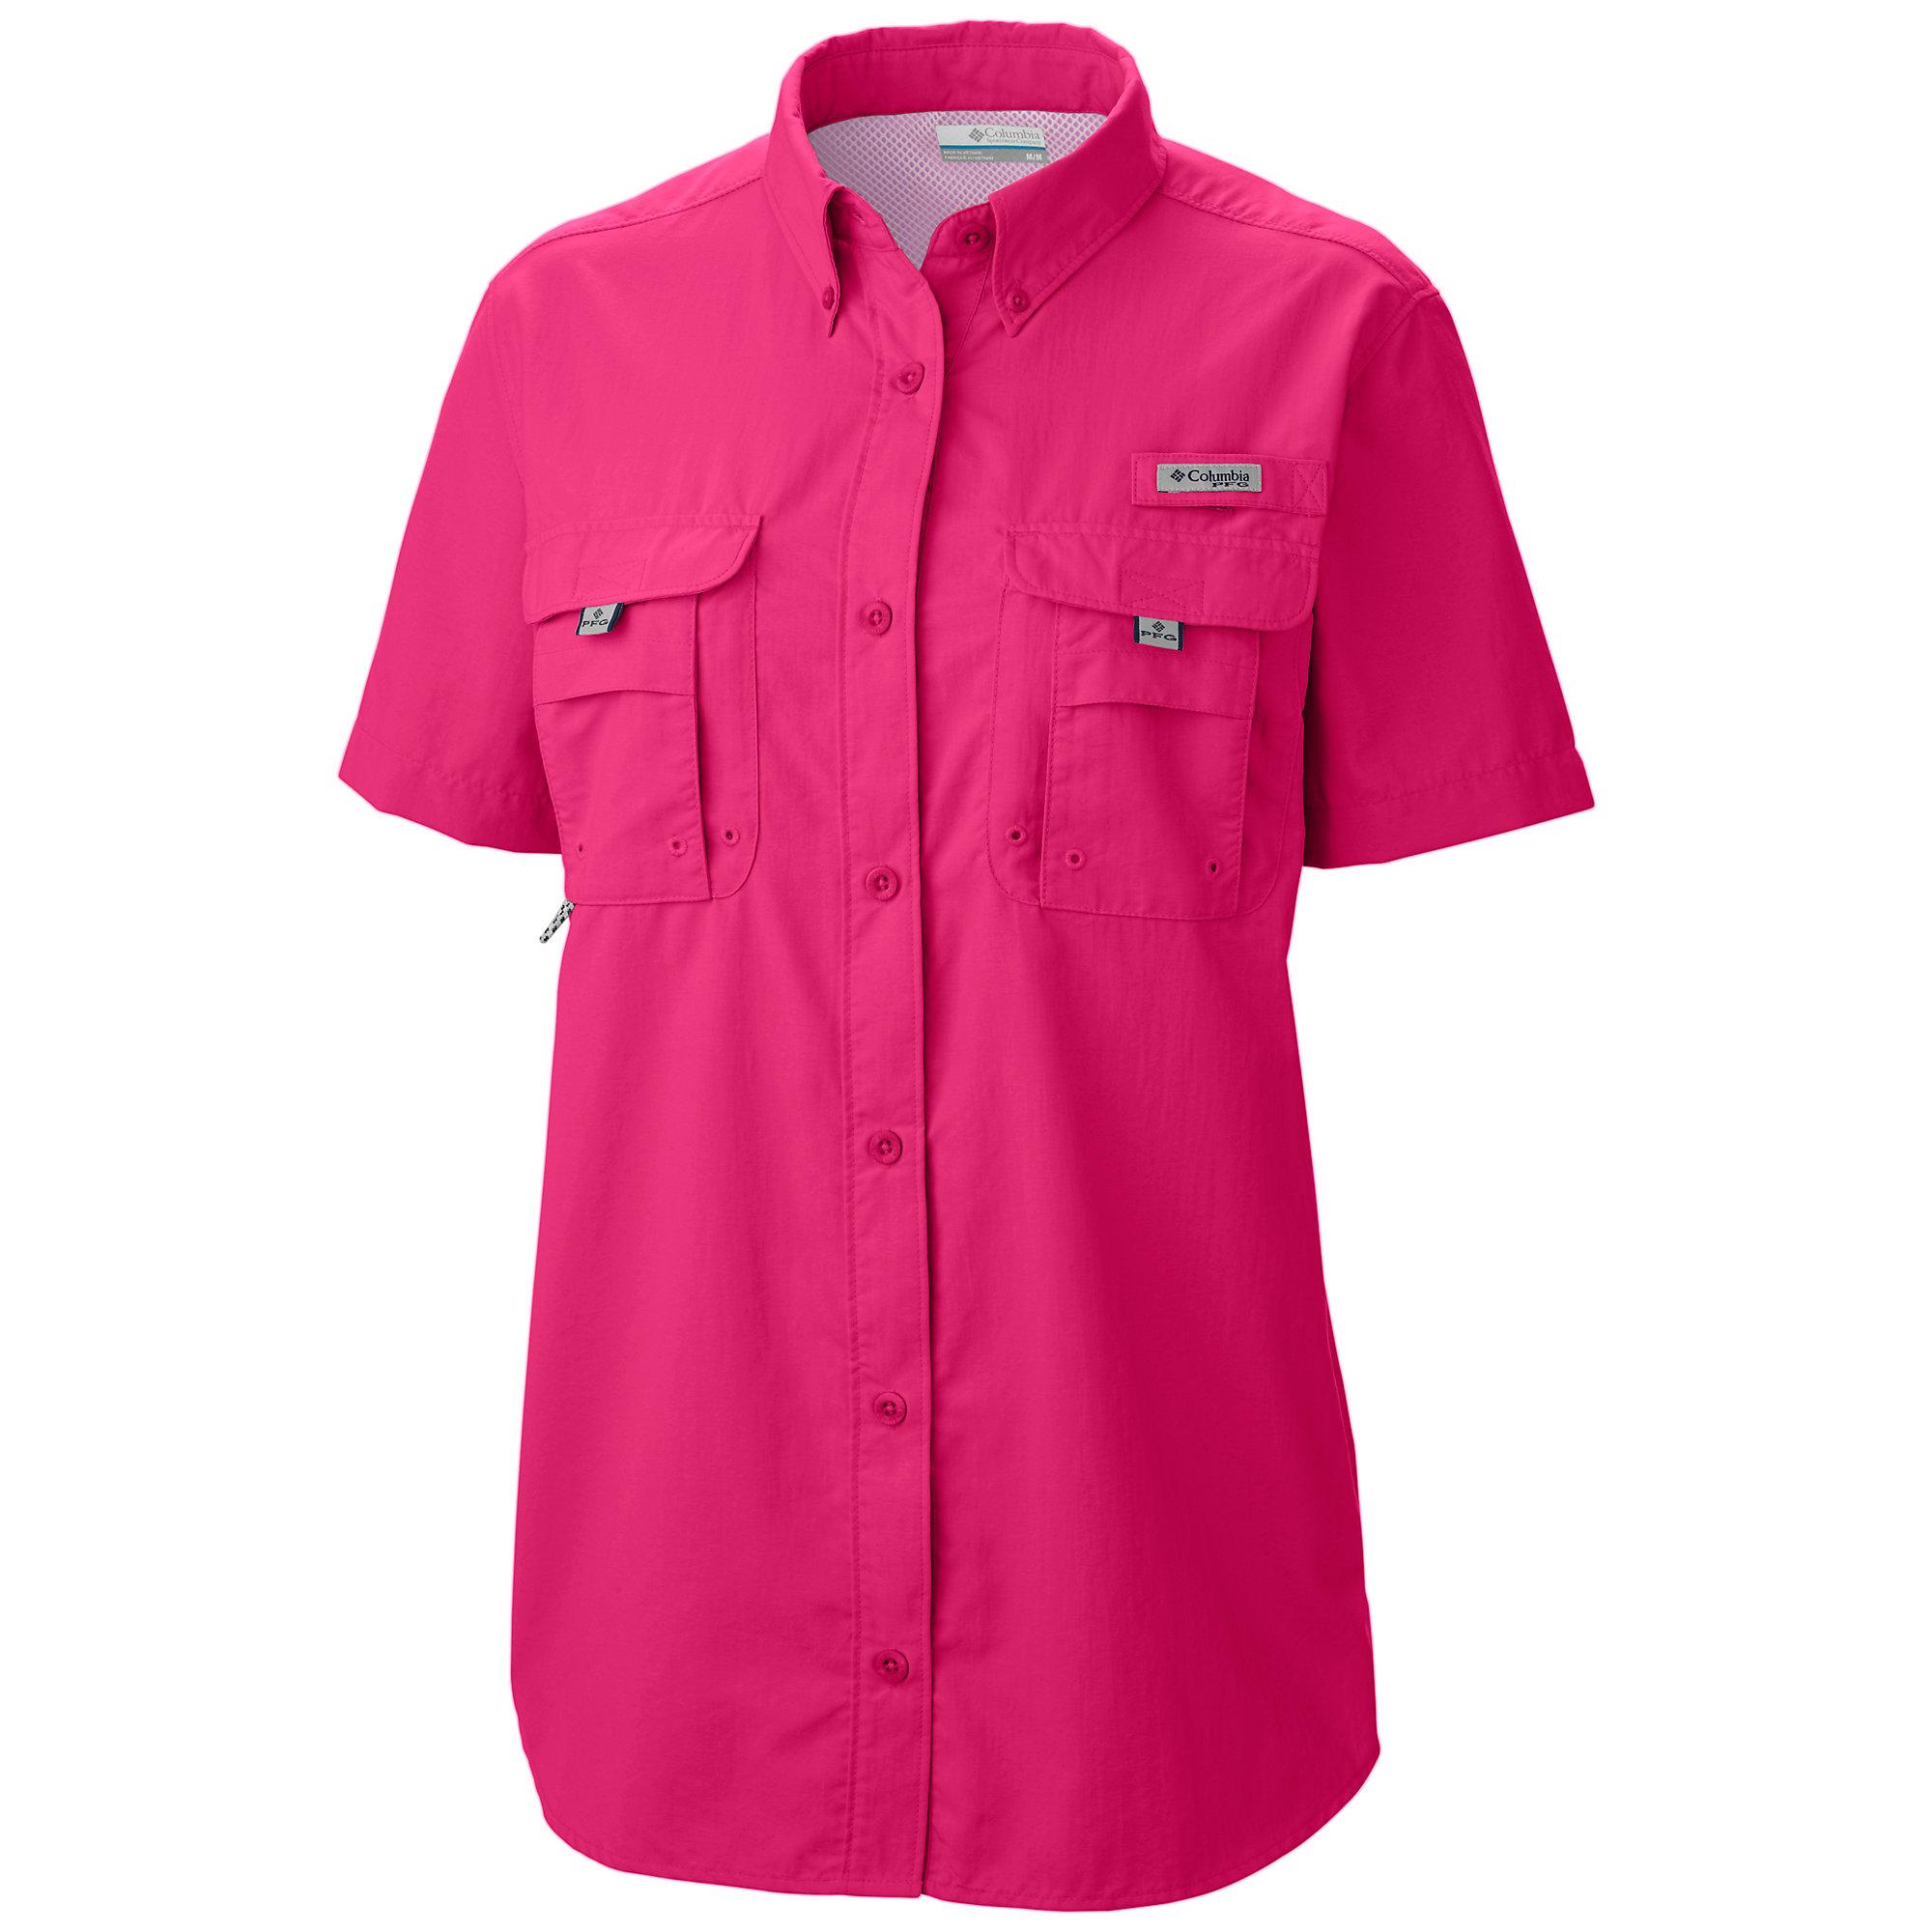 Upc 886535492639 columbia women 39 s bahama short sleeve for Custom embroidered columbia fishing shirts